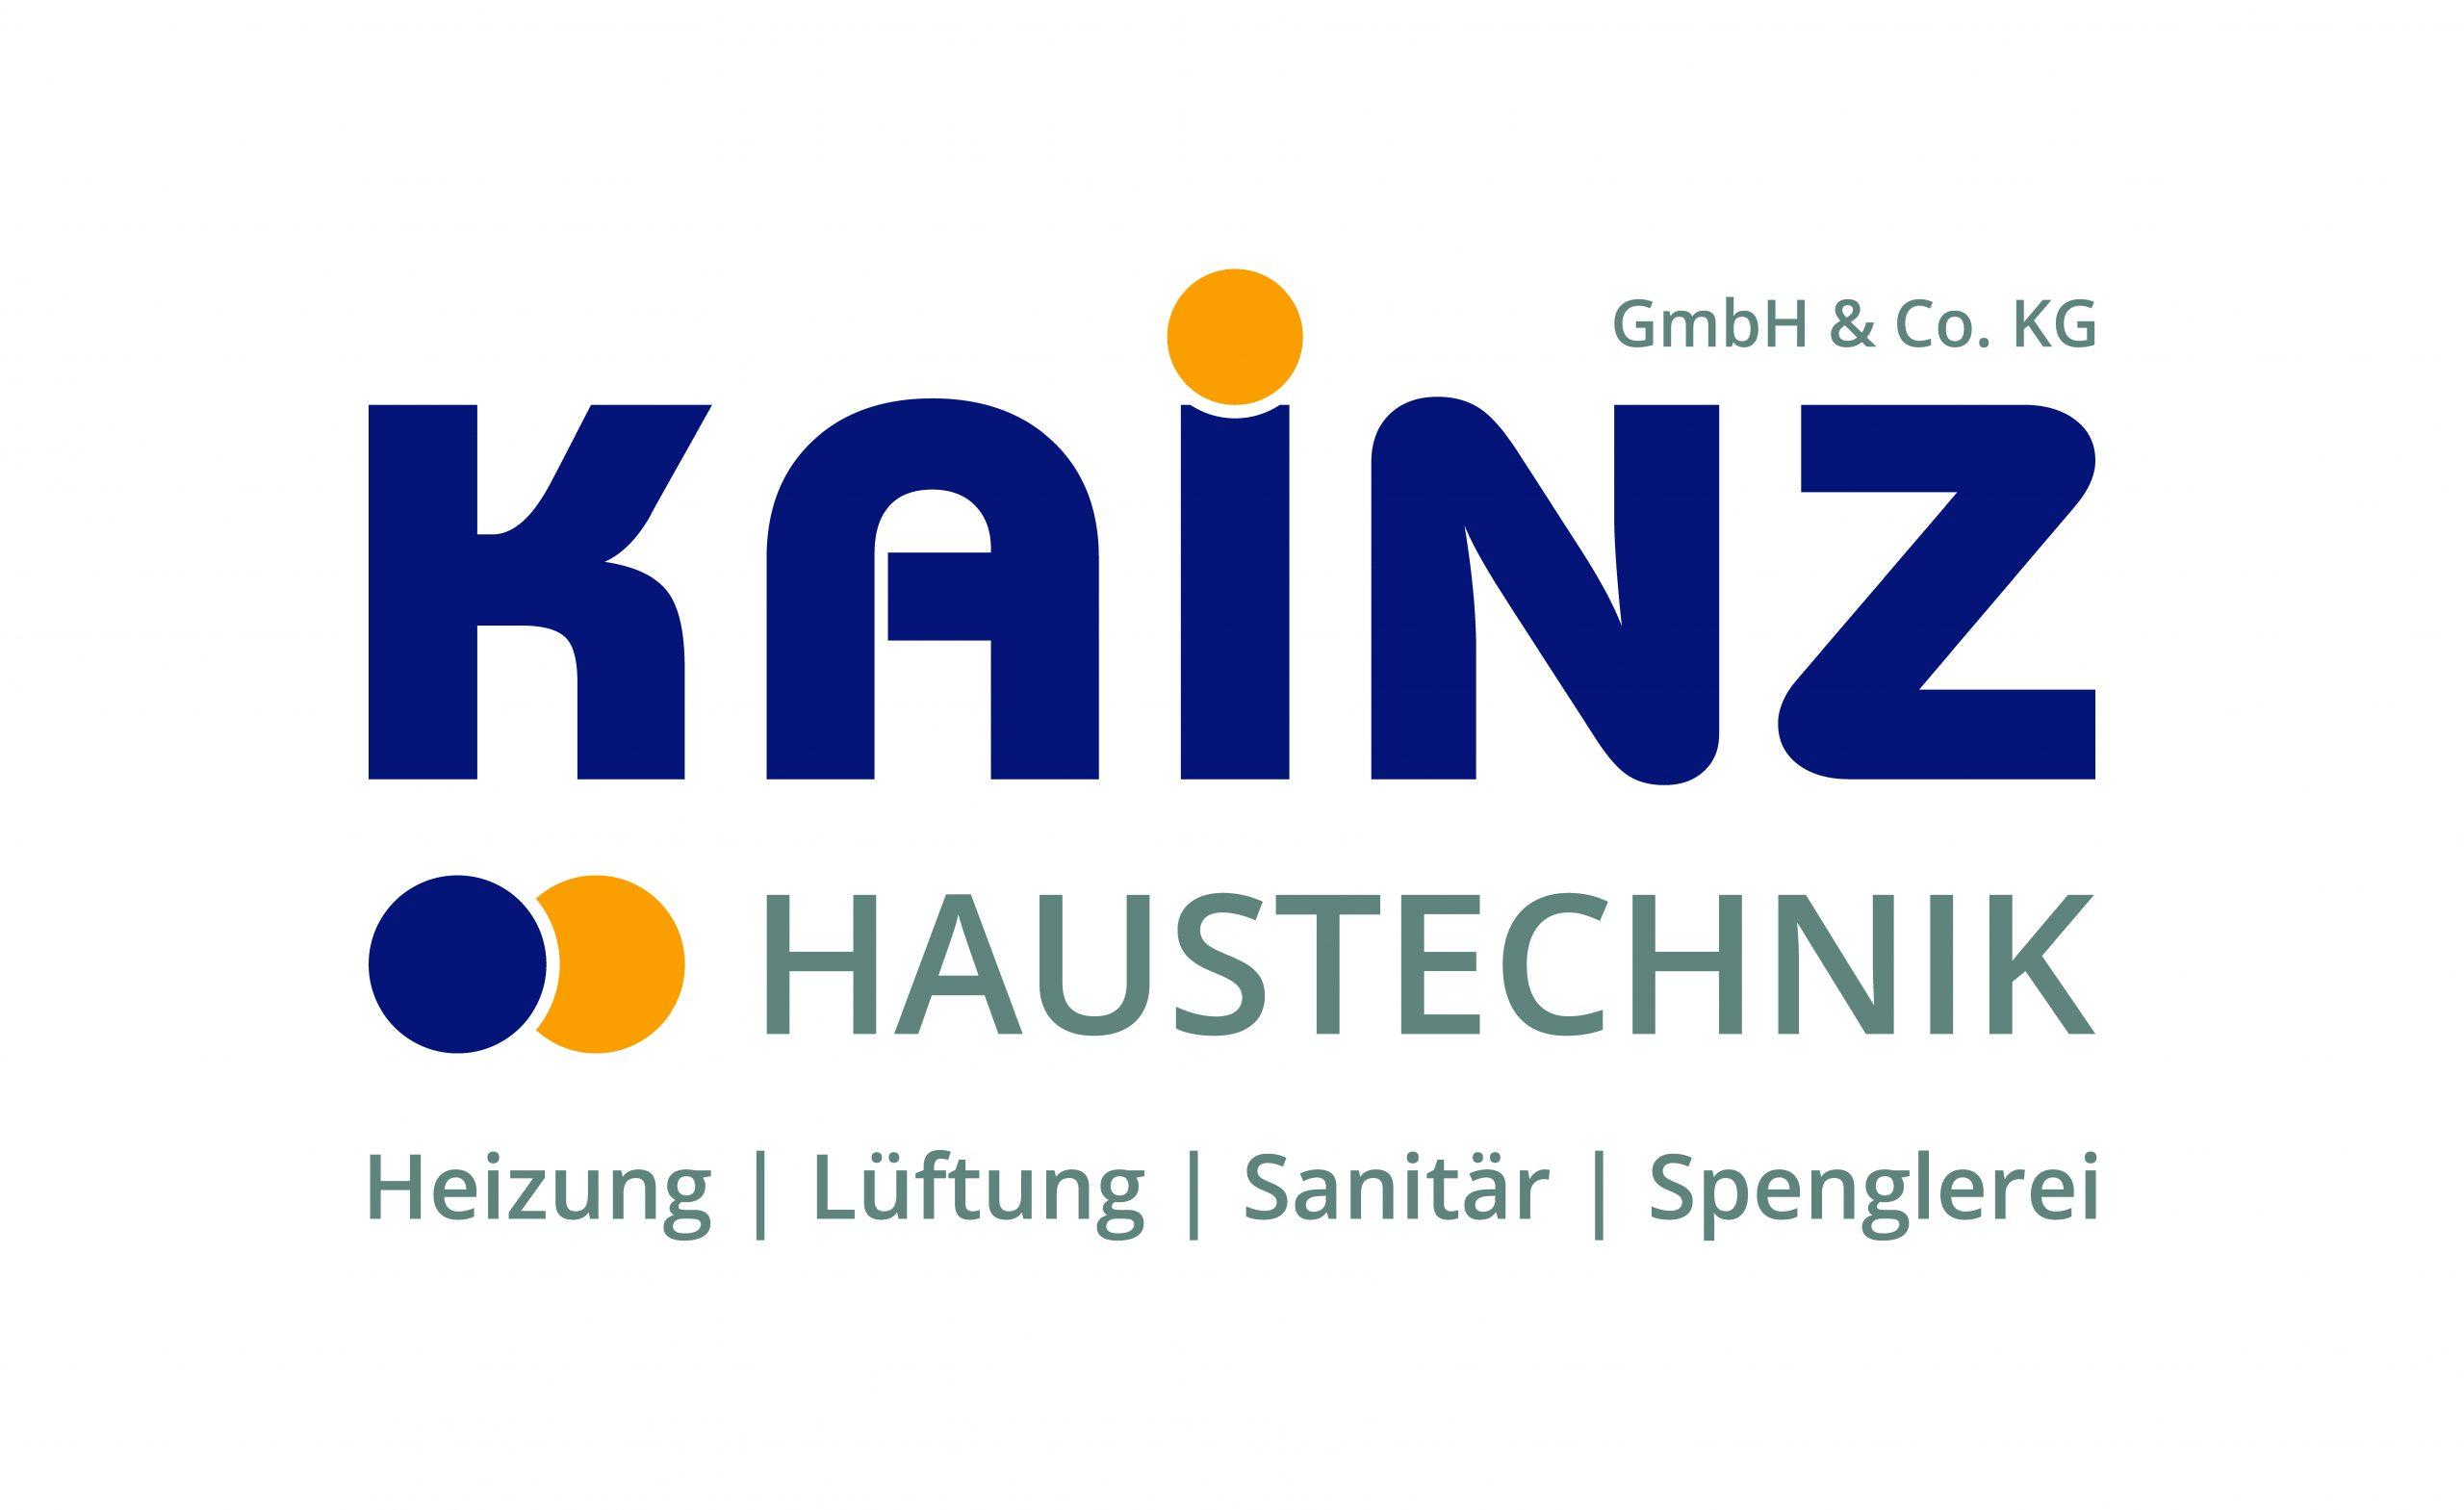 Kainz Haustechnik GmbH & Co. KG